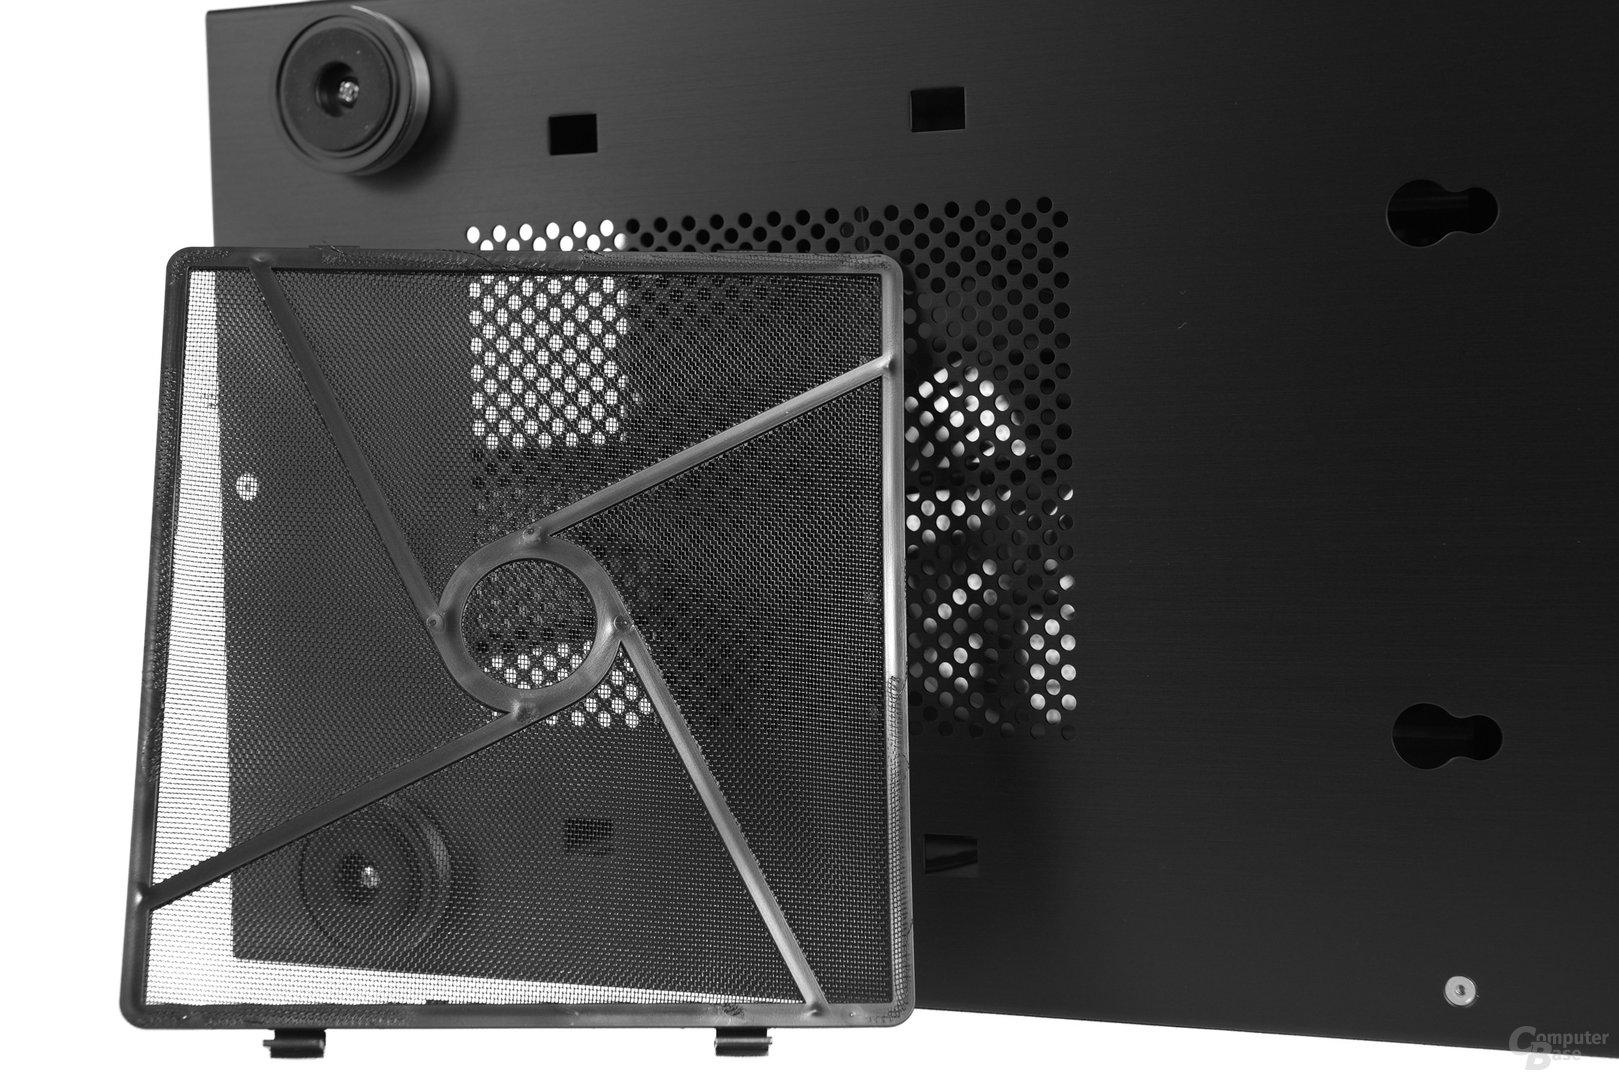 Lian Li PC-Q35 - Nylonstaubfilter